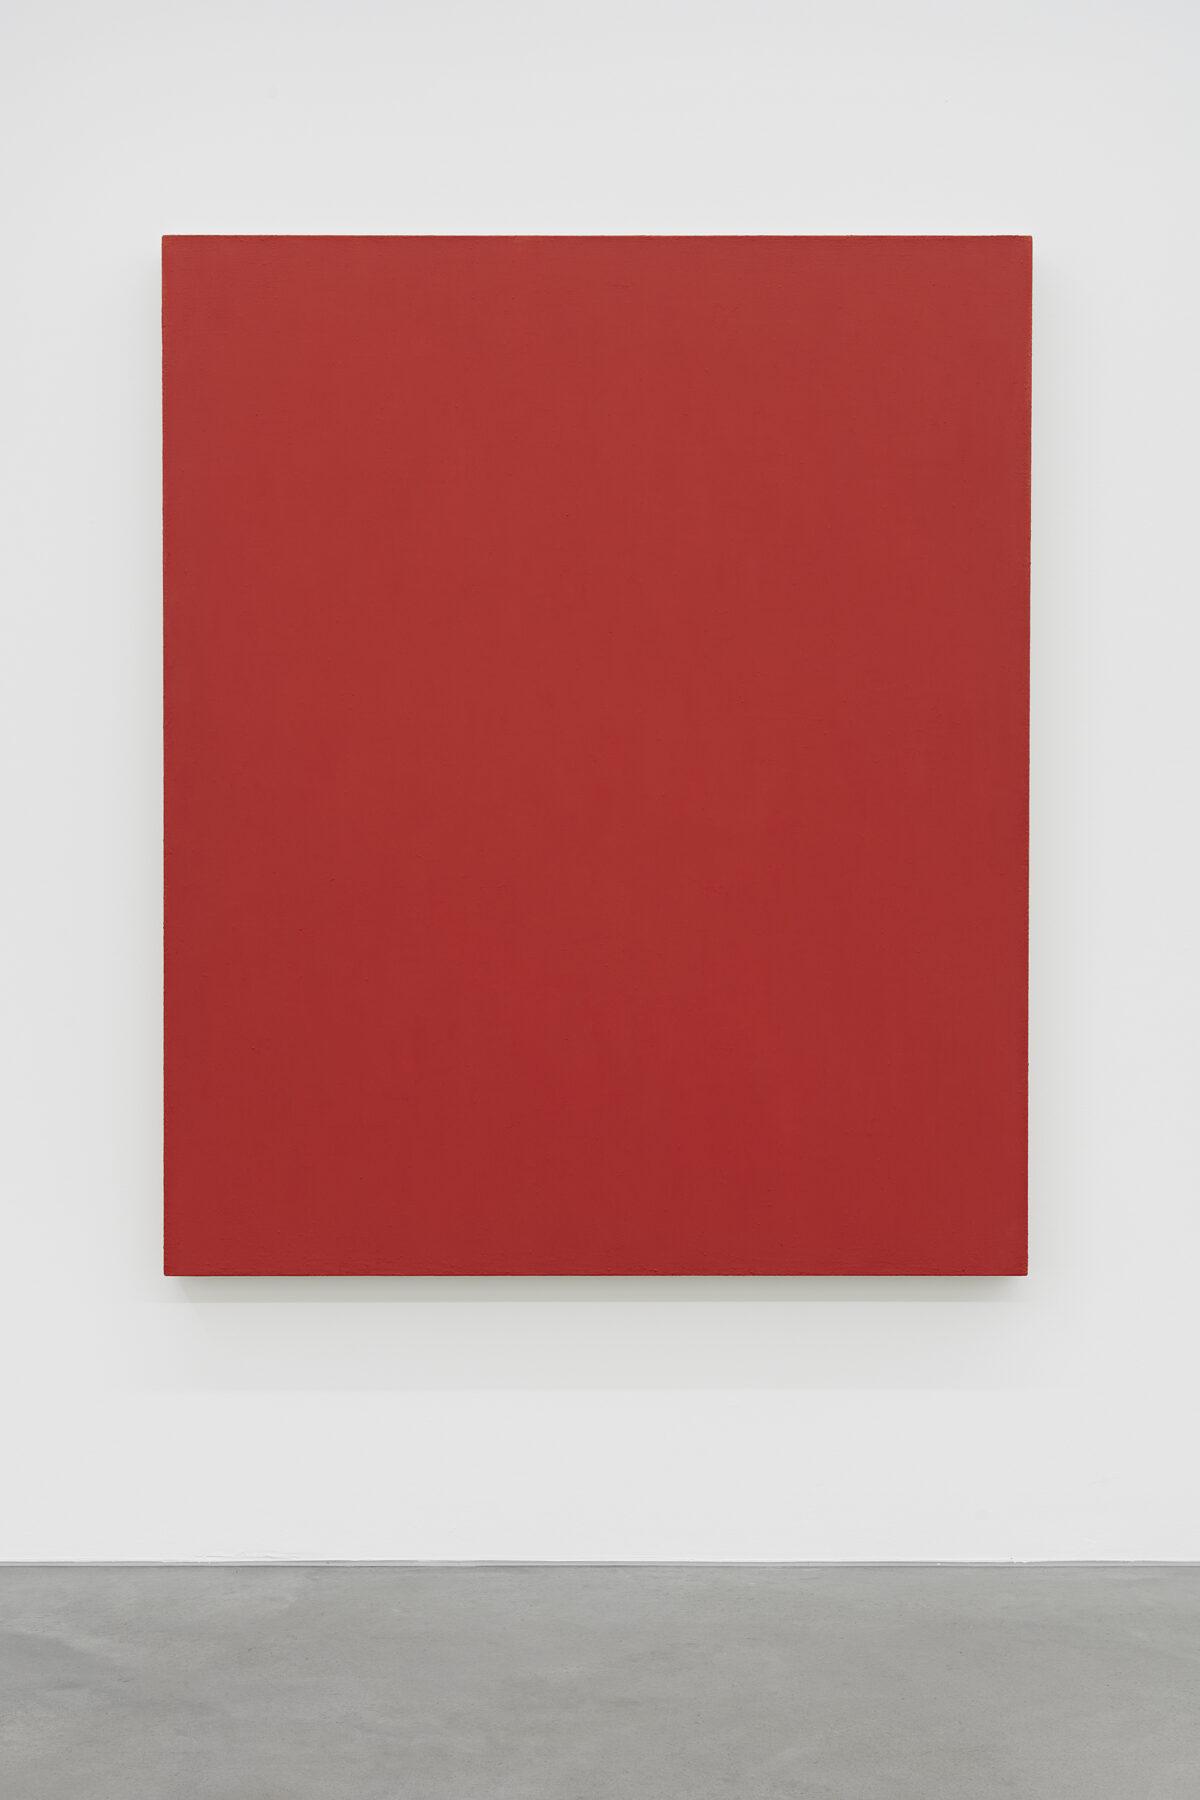 Phil Sims, Cat. 420 (orange/red), 2000,  Öl auf Leinwand, 153 x 128 cm. Courtesy Paul Ege Art Collection